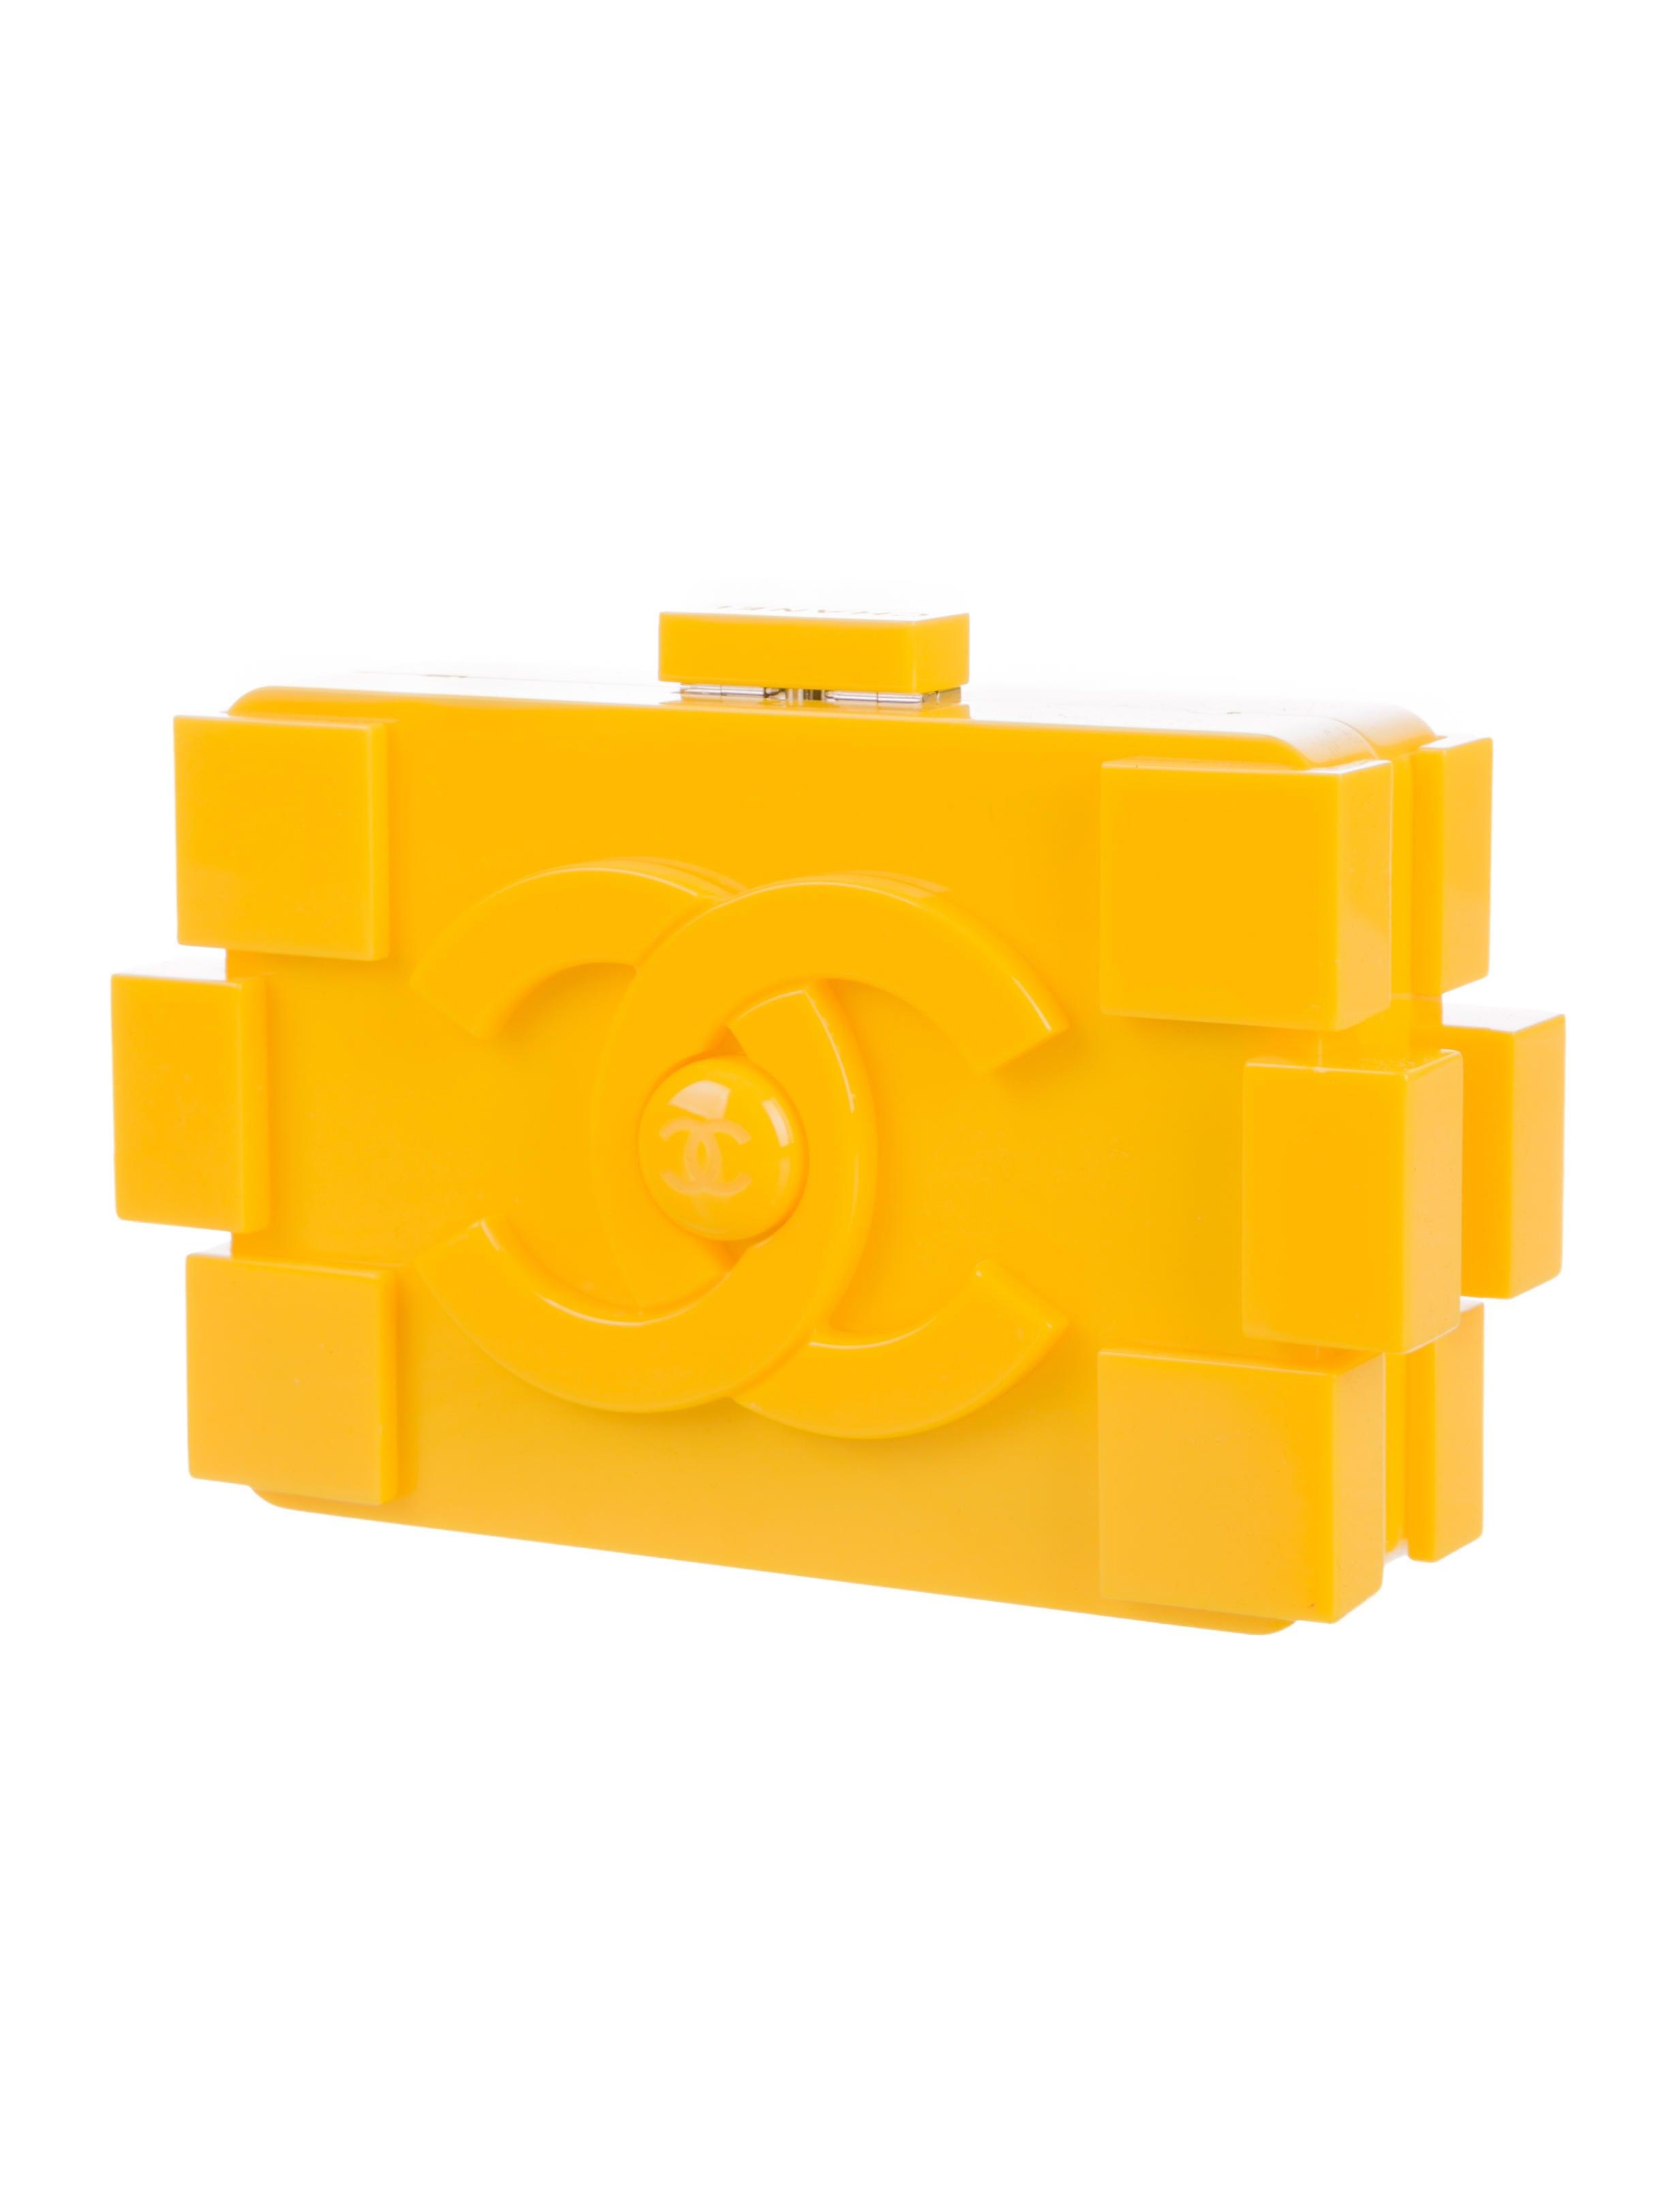 Chanel Lego CC Clutch - Handbags - CHA130112 | The RealReal